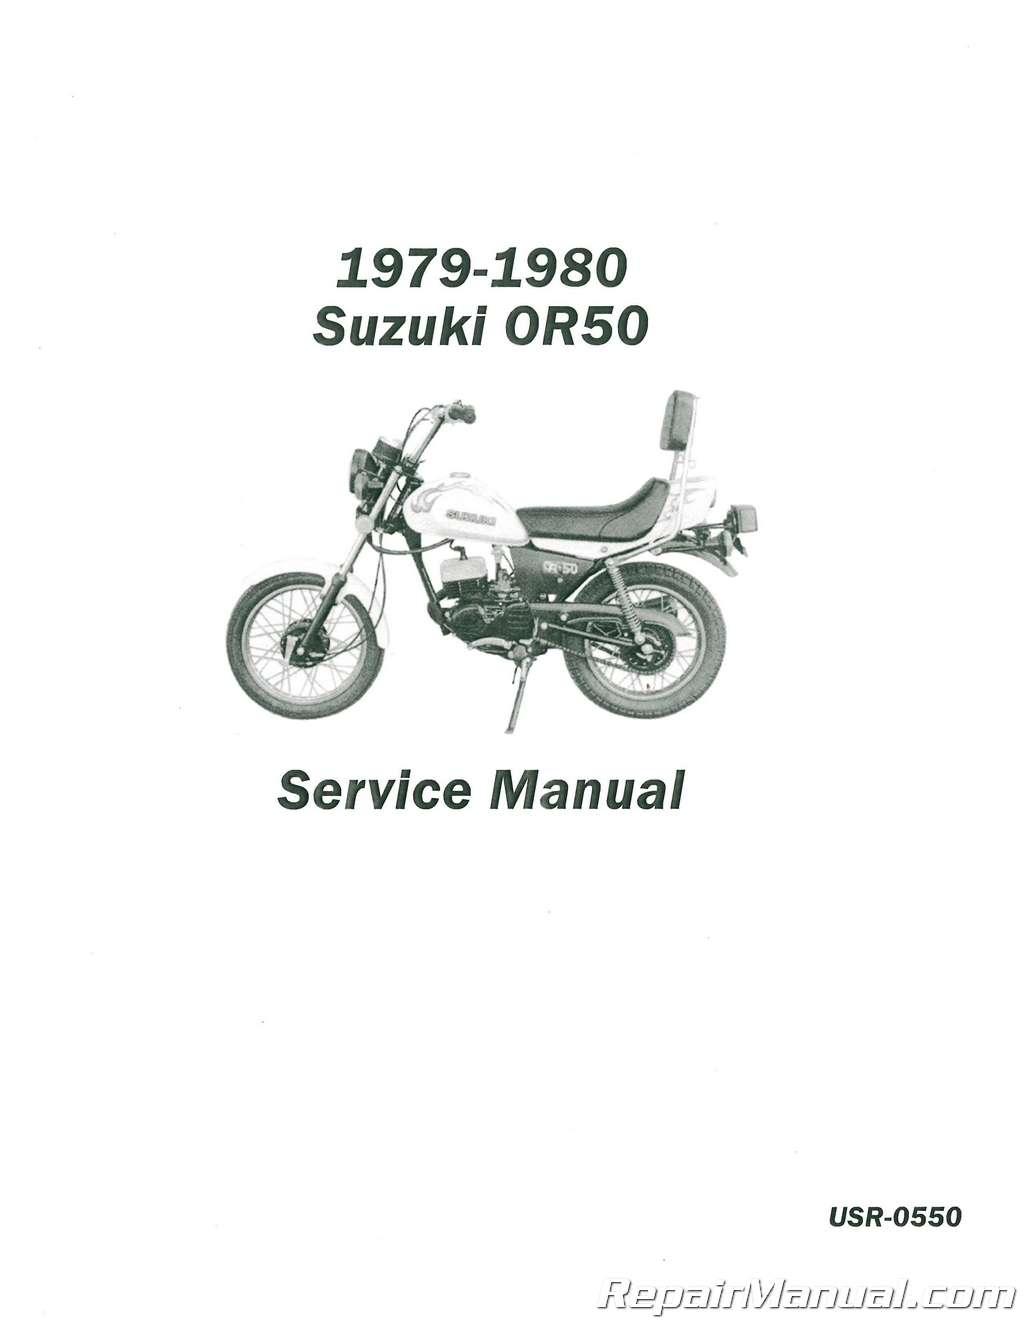 1979-1980 Suzuki OR50 Service Manual